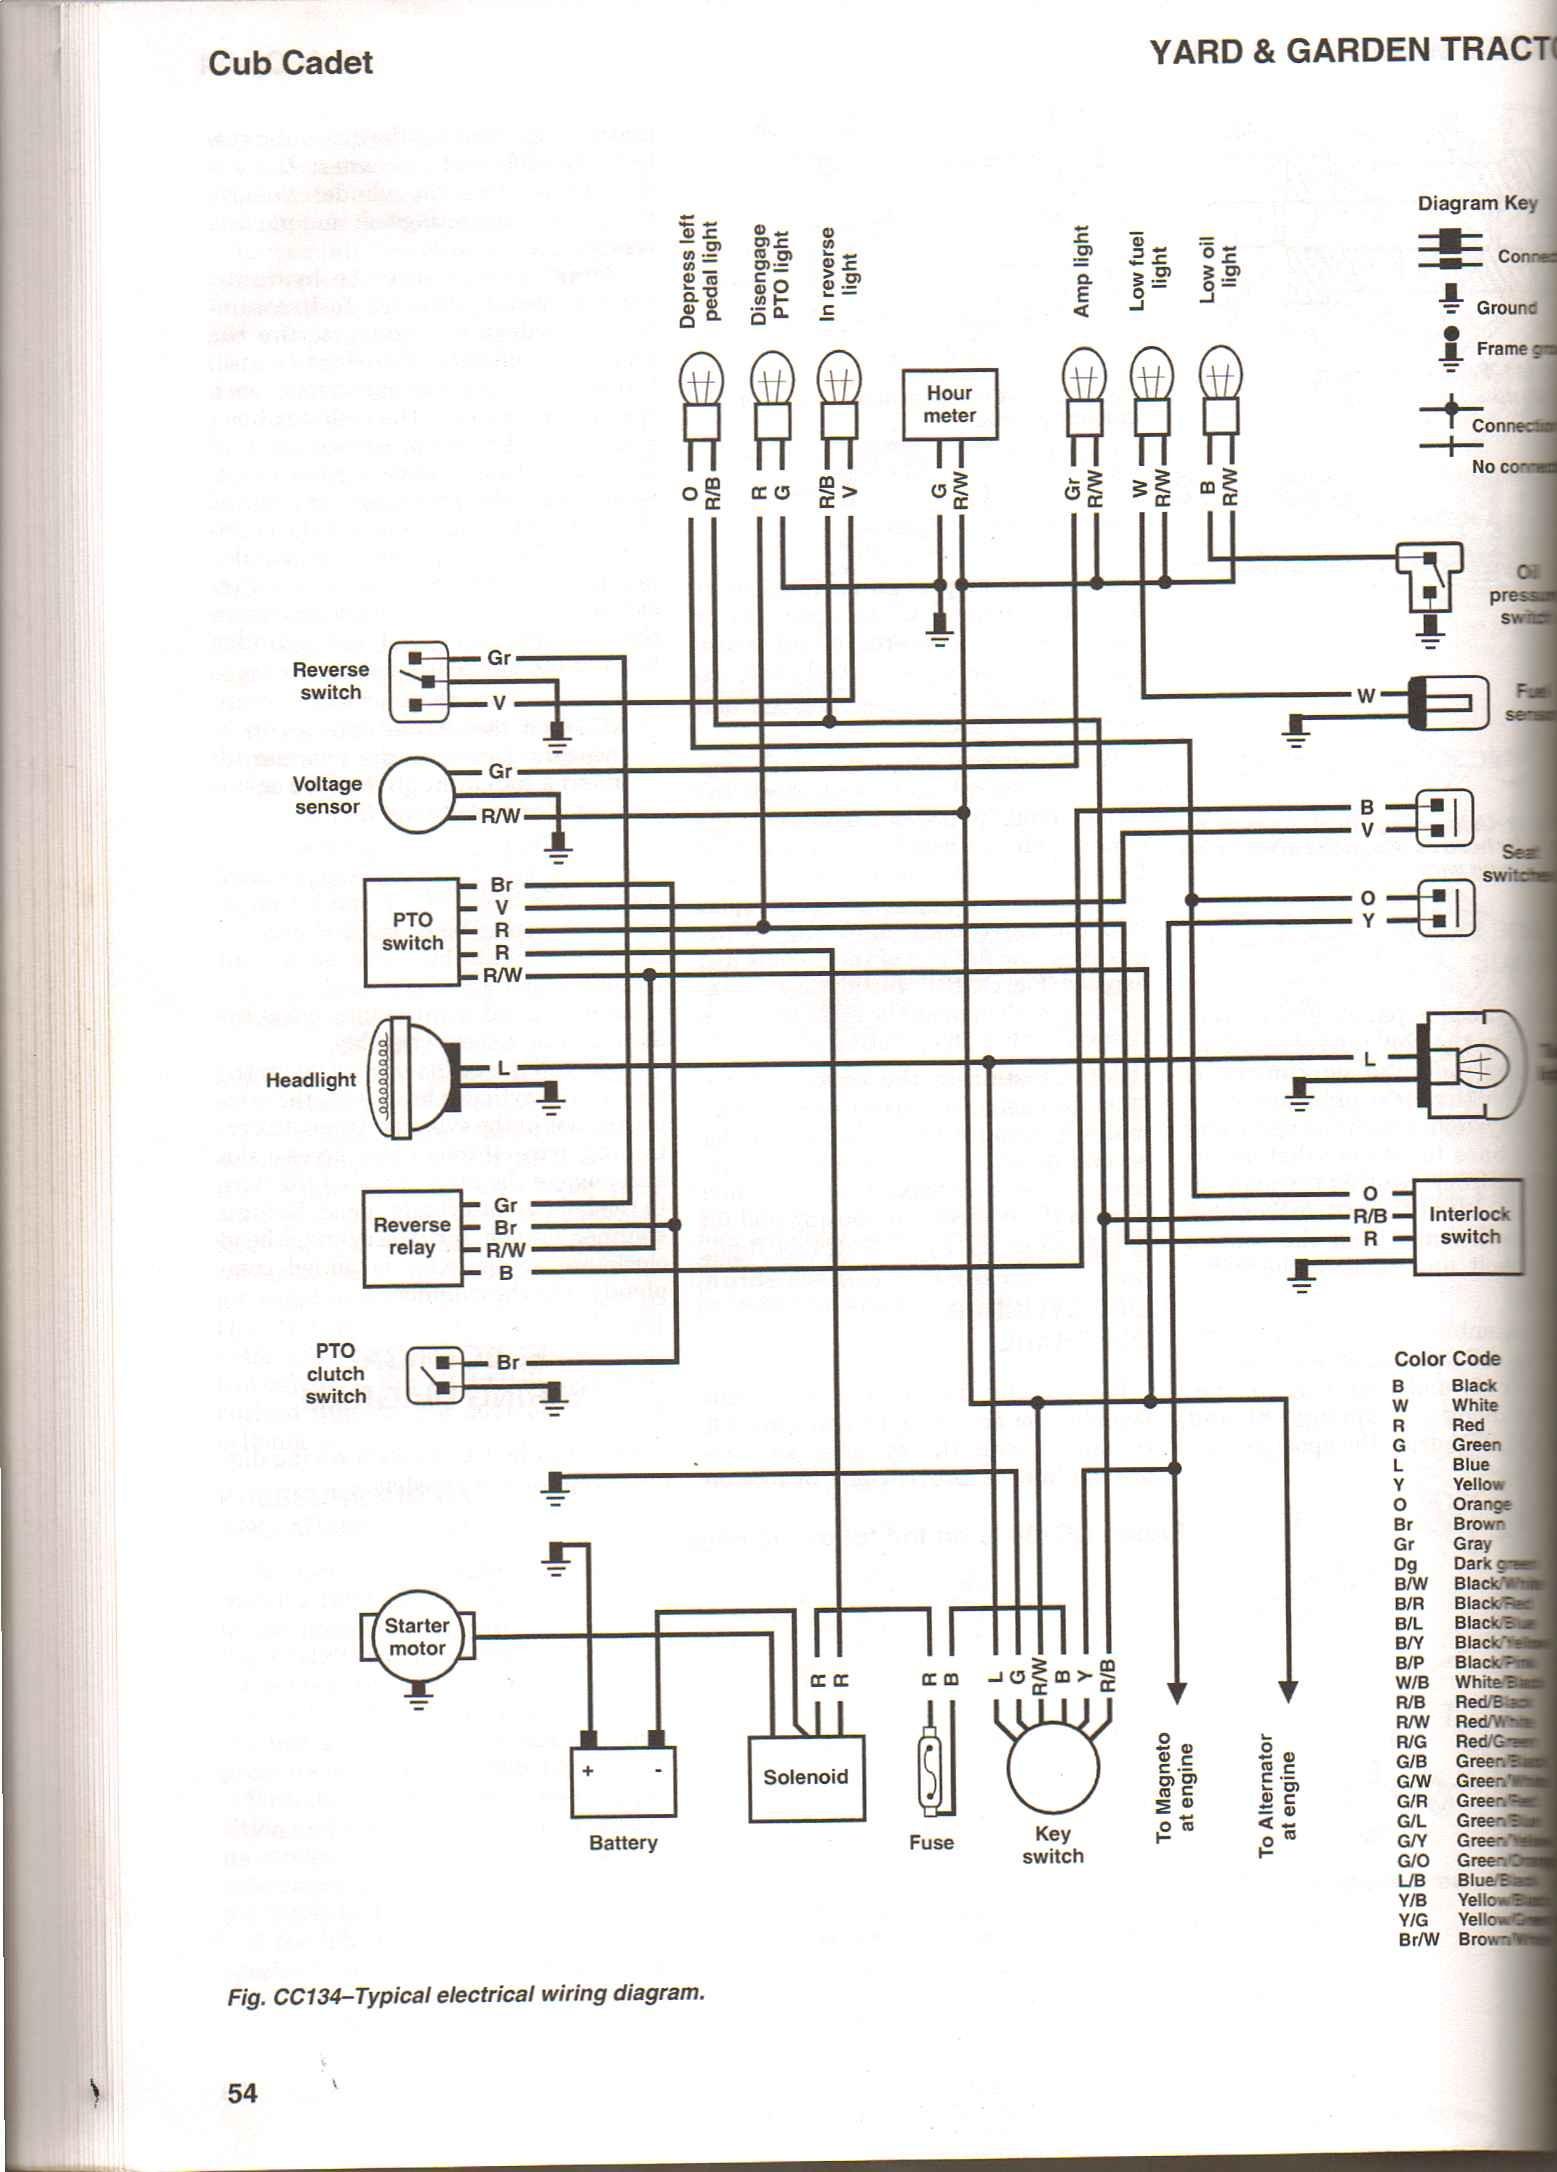 [QNCB_7524]  XZ_9702] Cub Cadet Kohler Wiring Diagram Also Cub Cadet Ltx 1045 Drive Belt Schematic  Wiring | Cub Cadet Ltx 1042 Wiring Diagram |  | Synk Gho Viewor Mohammedshrine Librar Wiring 101